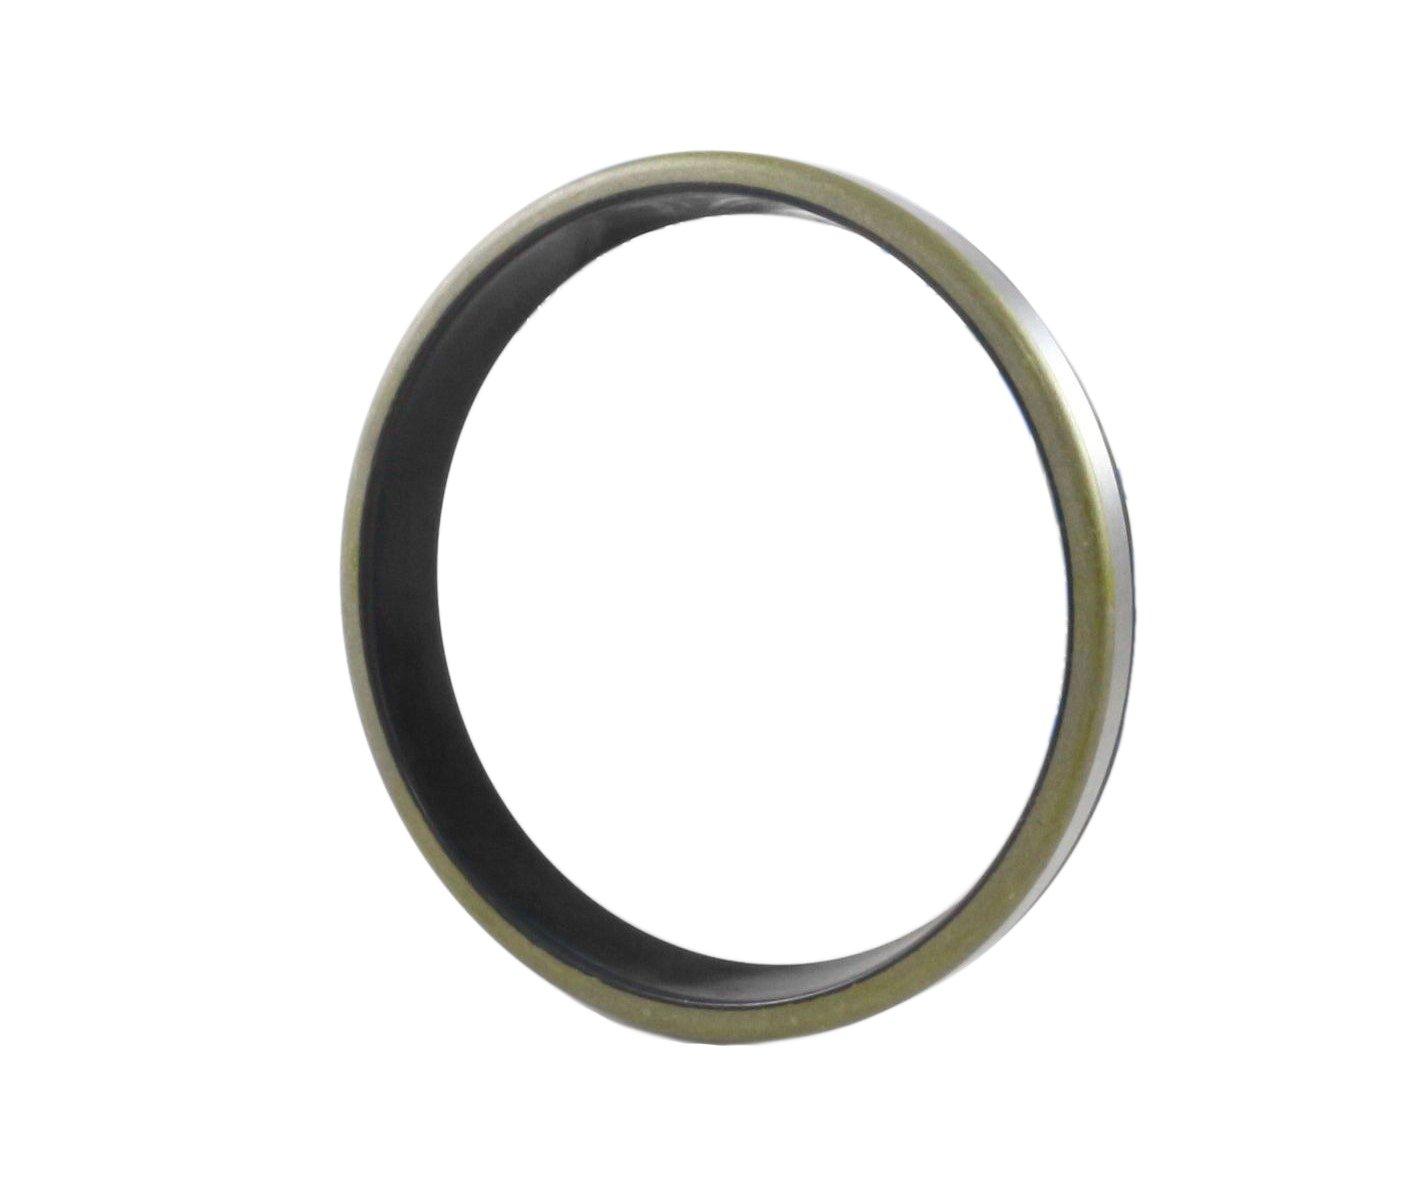 Wiper Seal 70X80X7 / 10 (10 PCS) Dust Seal GA |EAI Oil Seal with Ground Outer Metal housing 70mmX80mmX7/10mm | GA70X80X7/10 | 2.756''x3.150''x0.276'' / 0.394'' by EAI (Image #2)